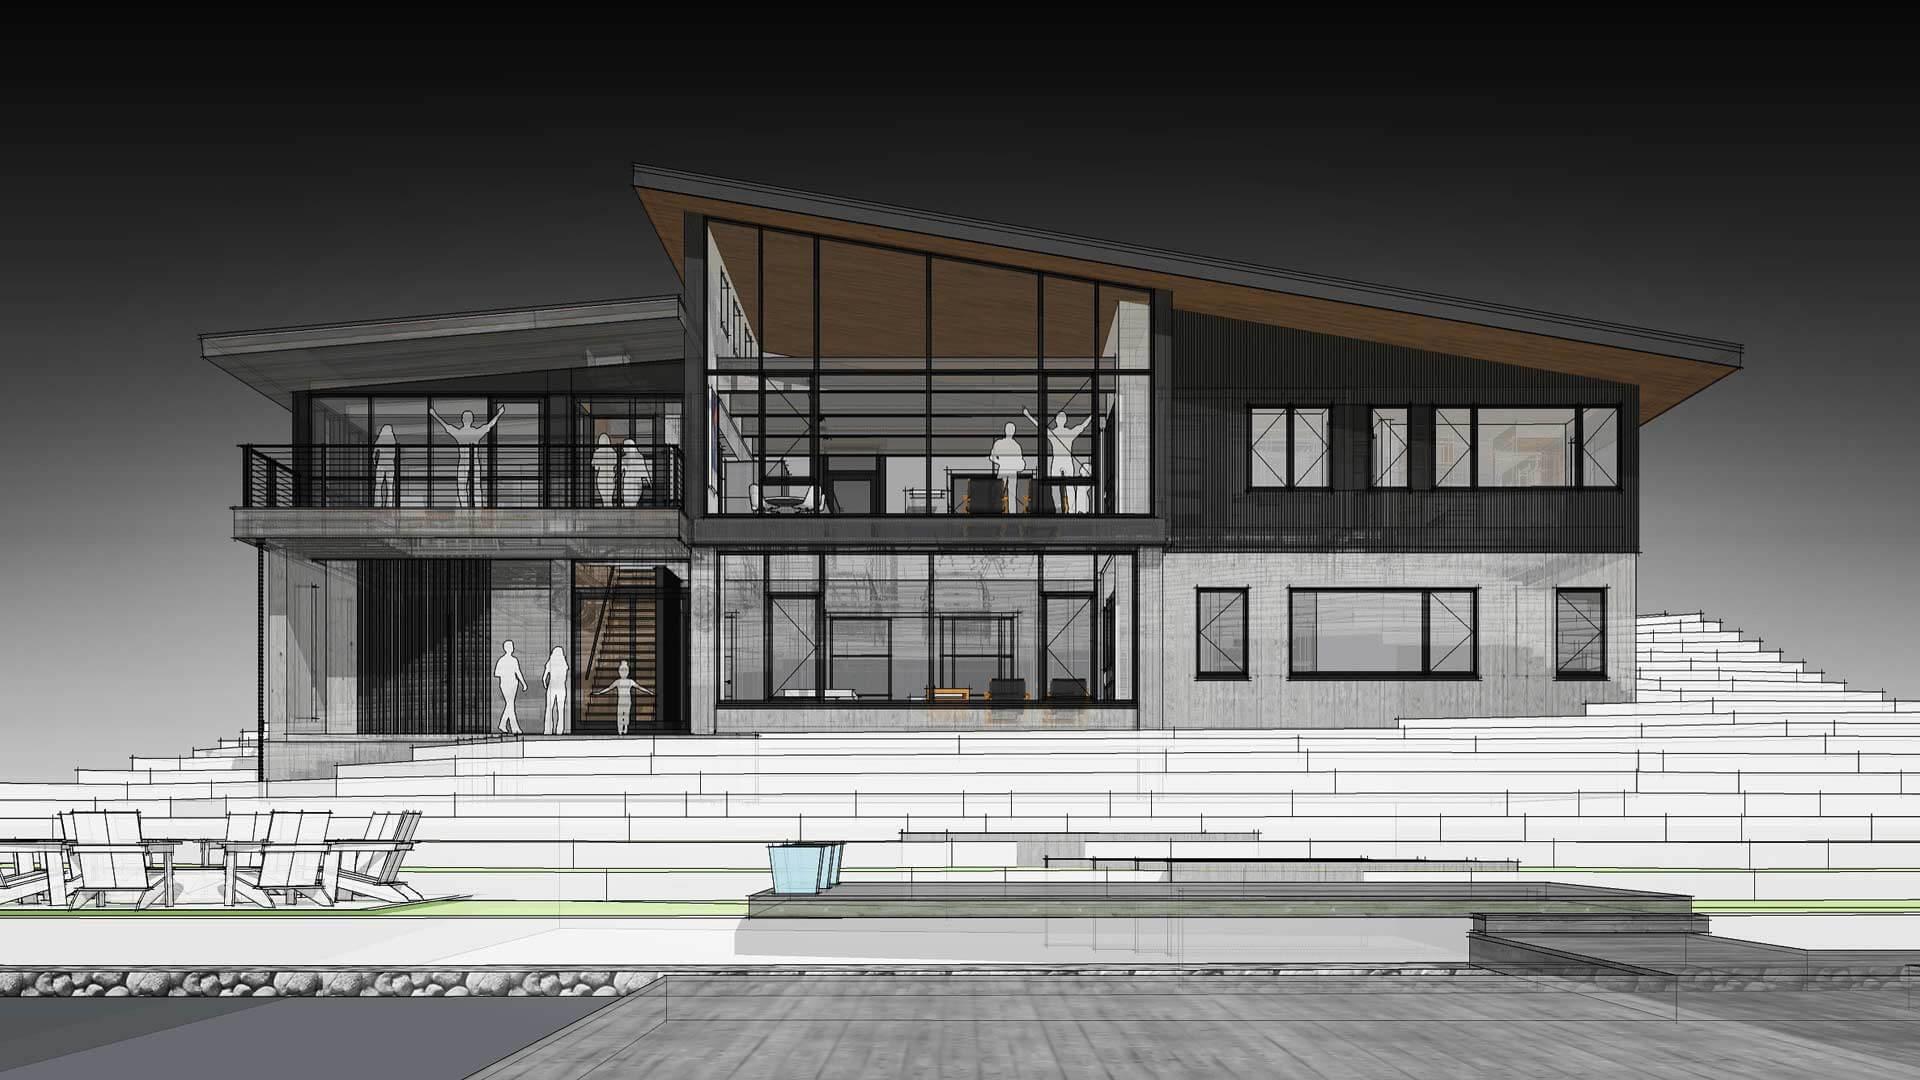 Lakeside Exterior Elevation - Modern Lakeside Retreat - Grandview Lake - Columbus, Indiana - HAUS | Architecture